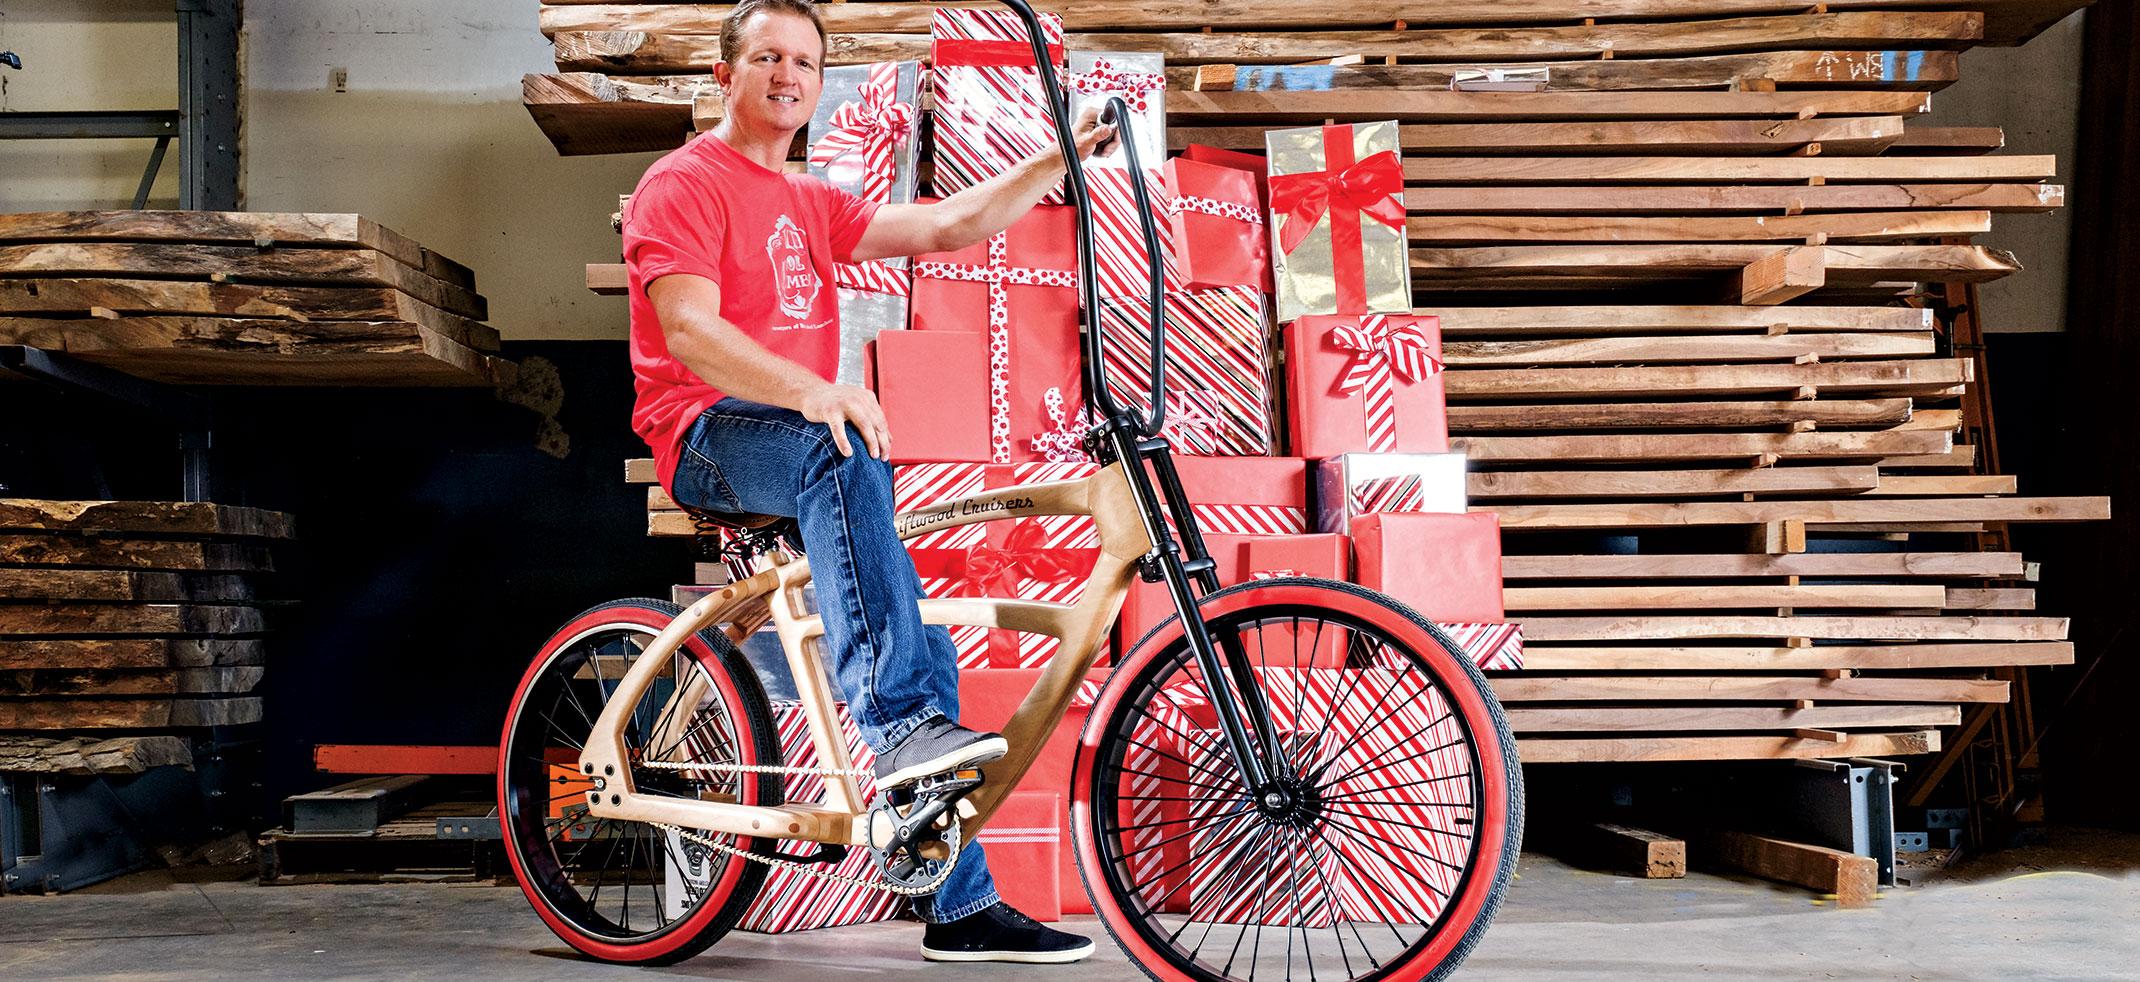 dcefdc489 Arizona Makers & Local Gift Guide - PHOENIX magazine